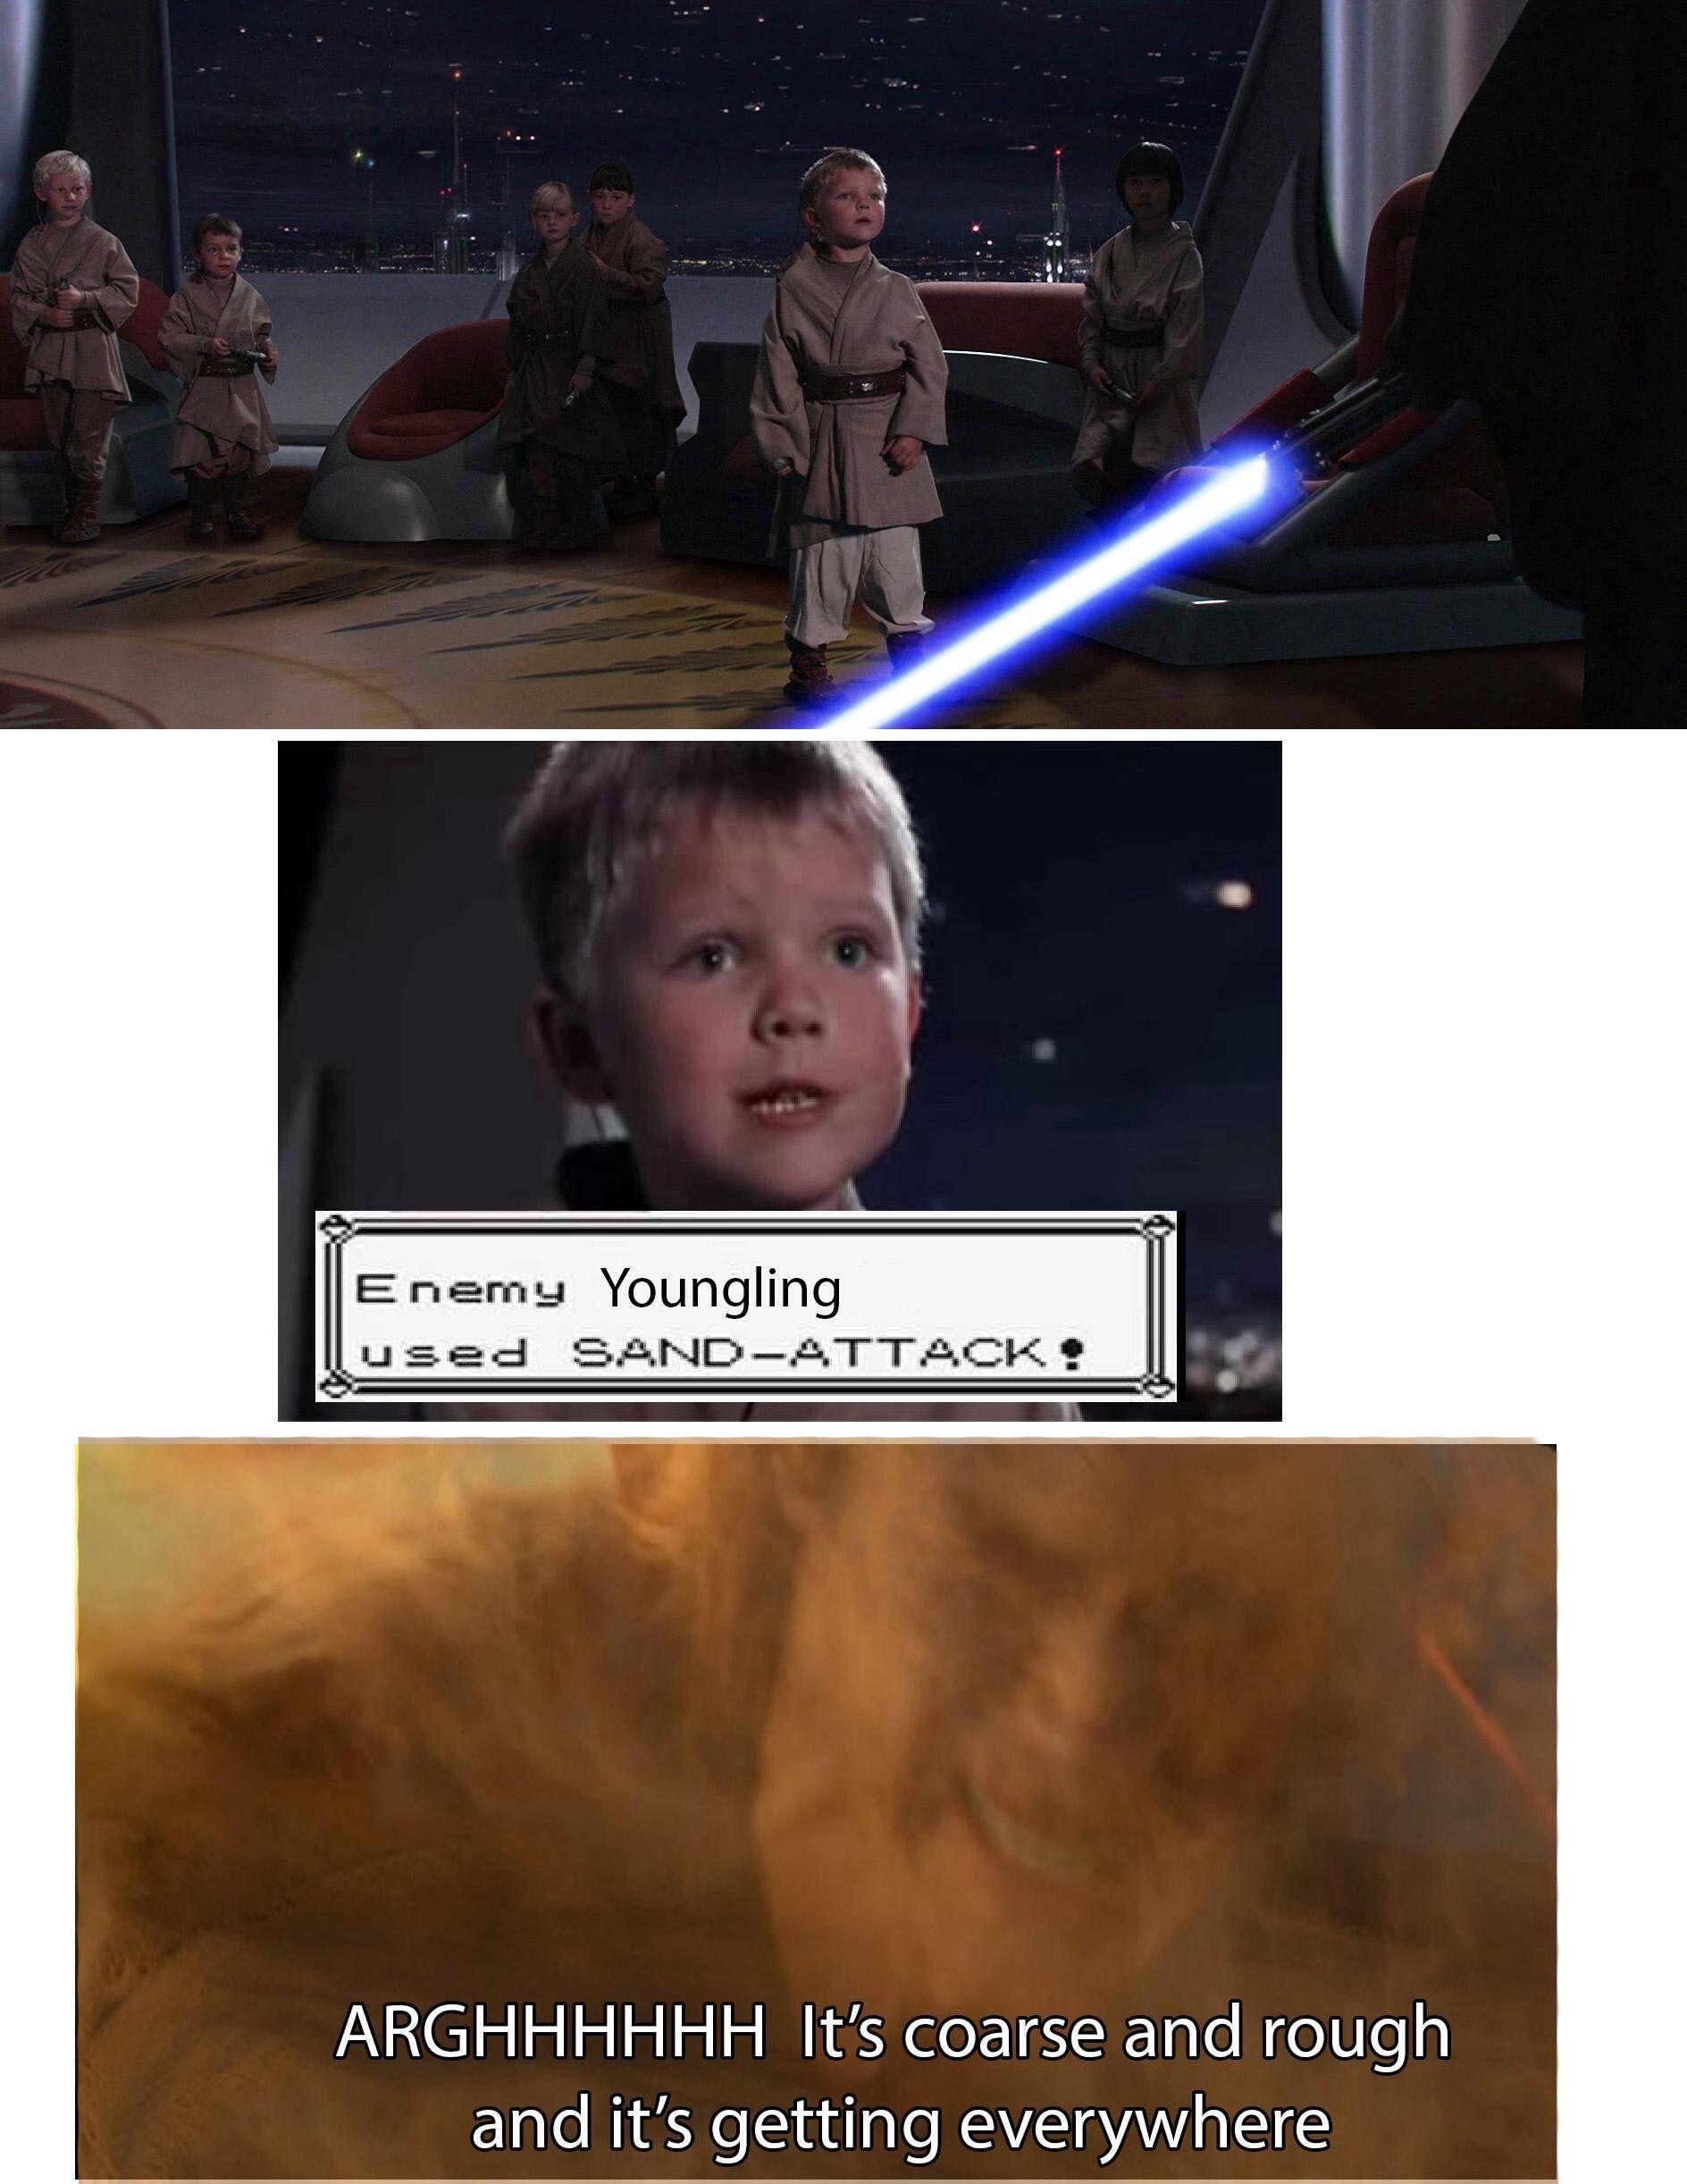 Super Effective Star Wars Jokes Star Wars Humor Star Wars Quotes